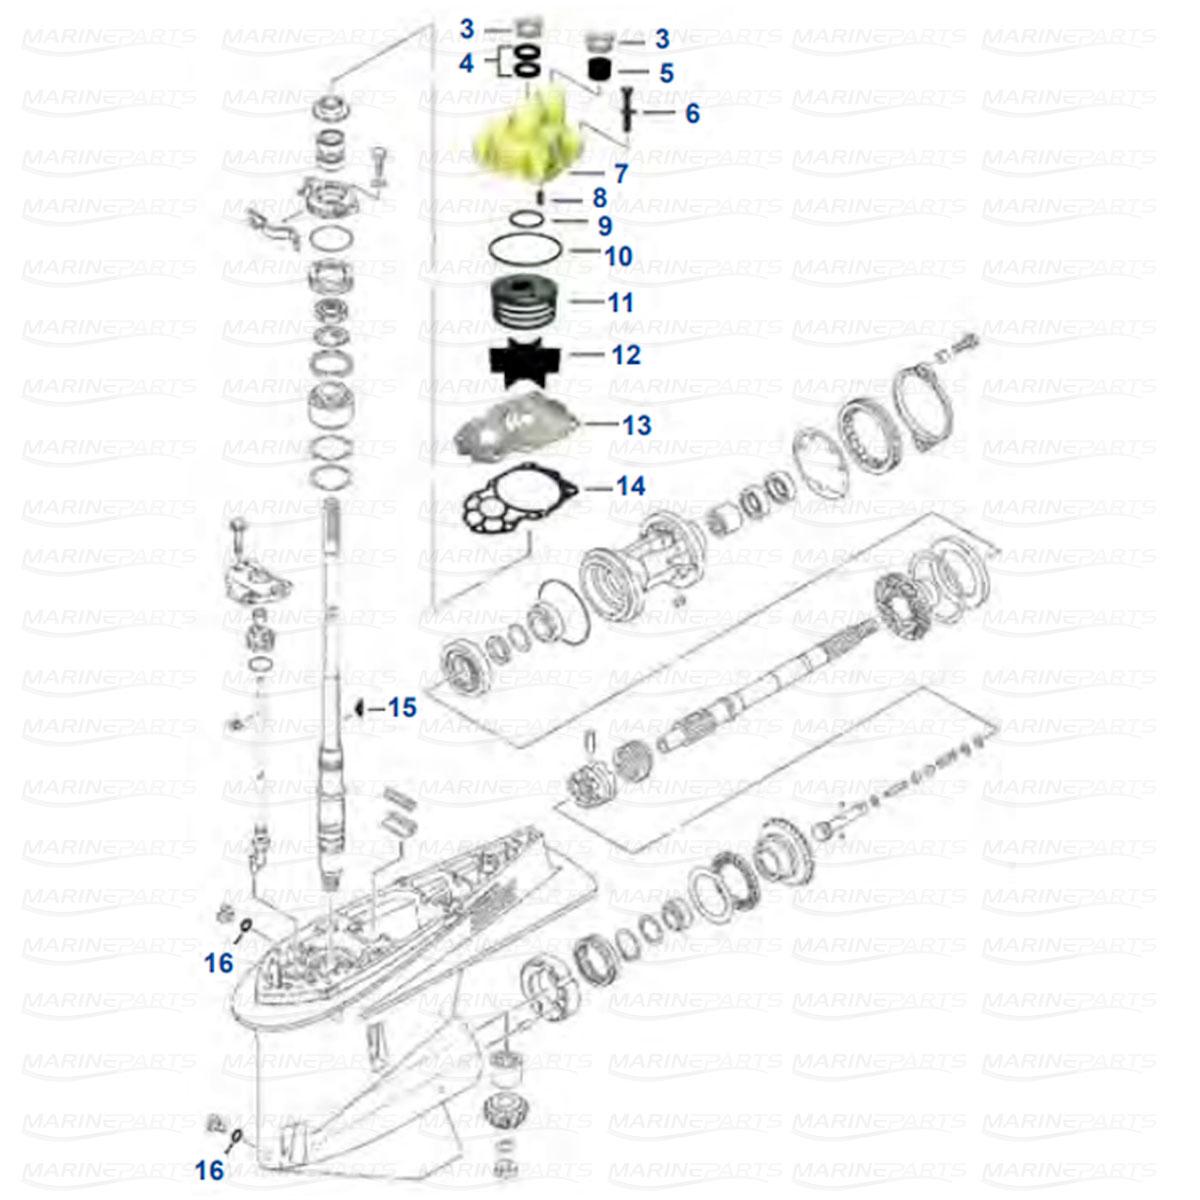 Gearcase parts Yamaha V6 F225 / F250 / F300